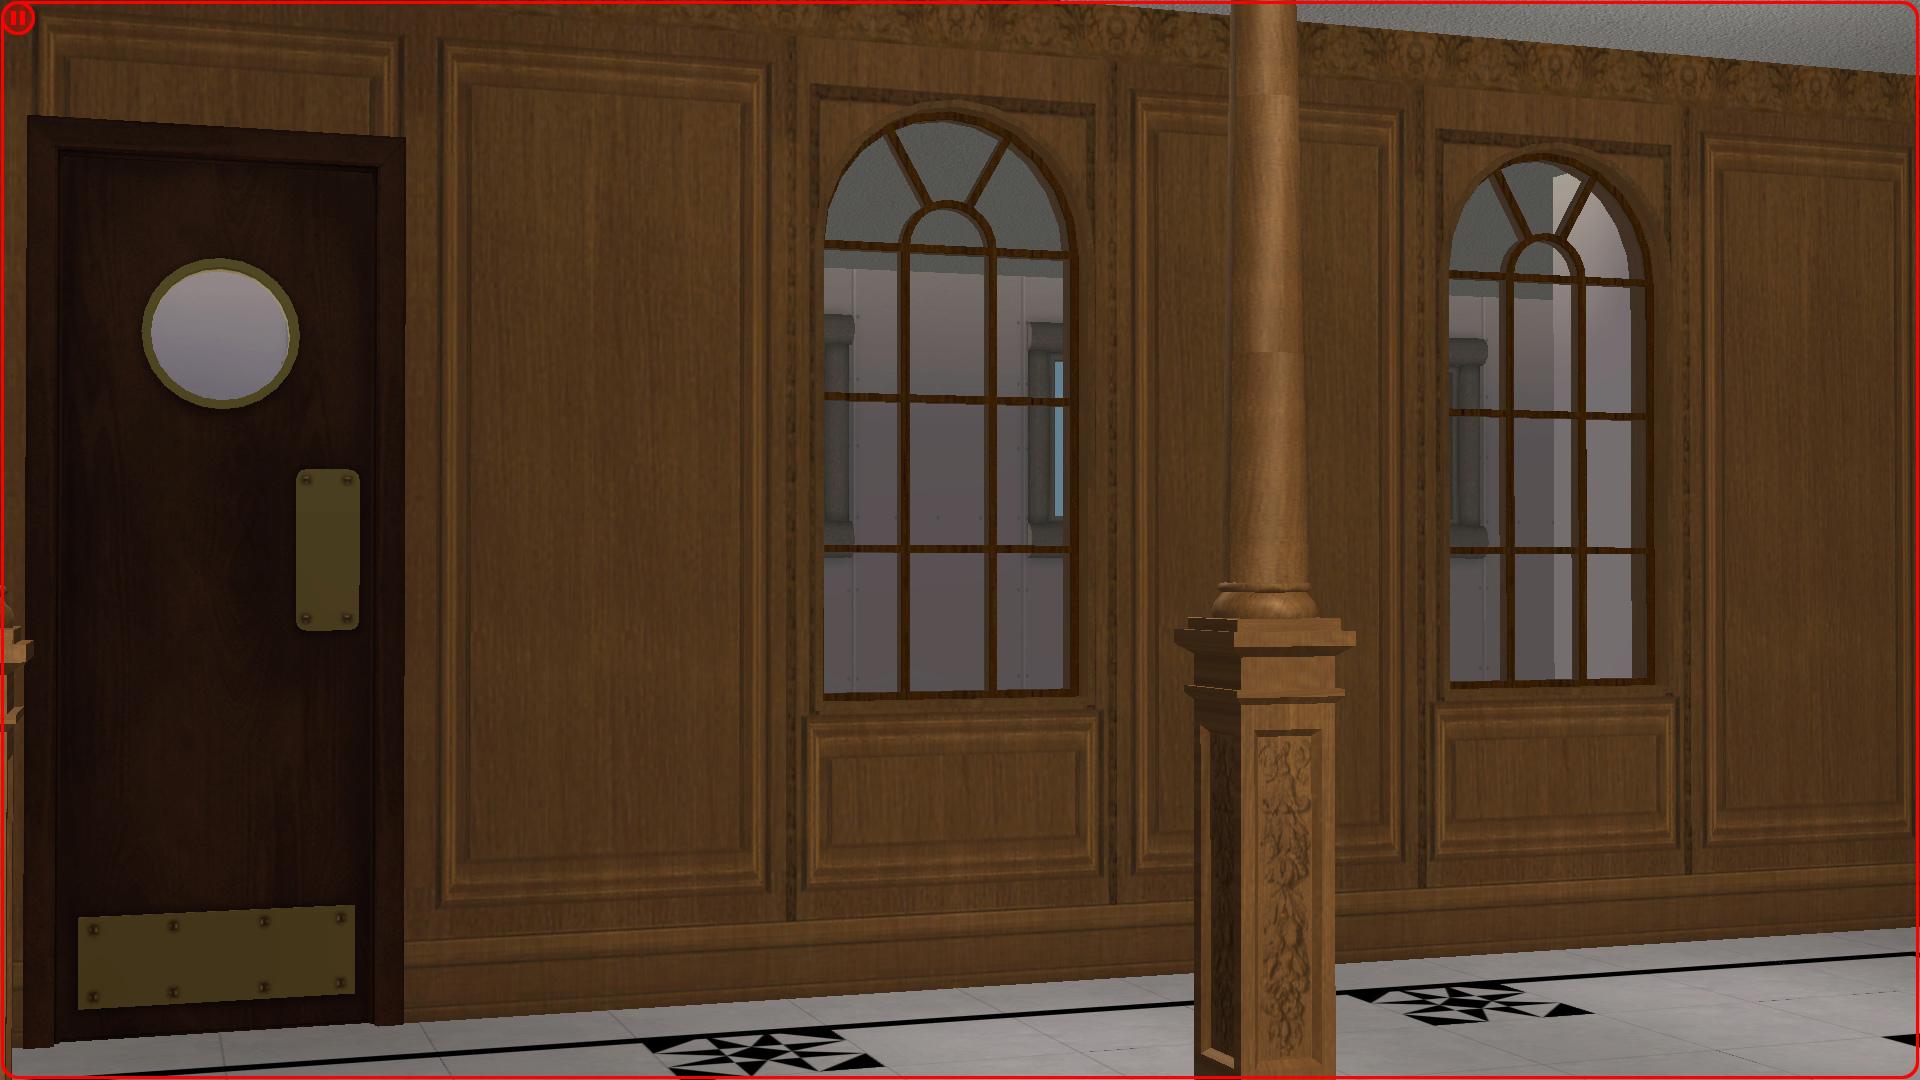 The Sims 2 Titanic Sims2e54